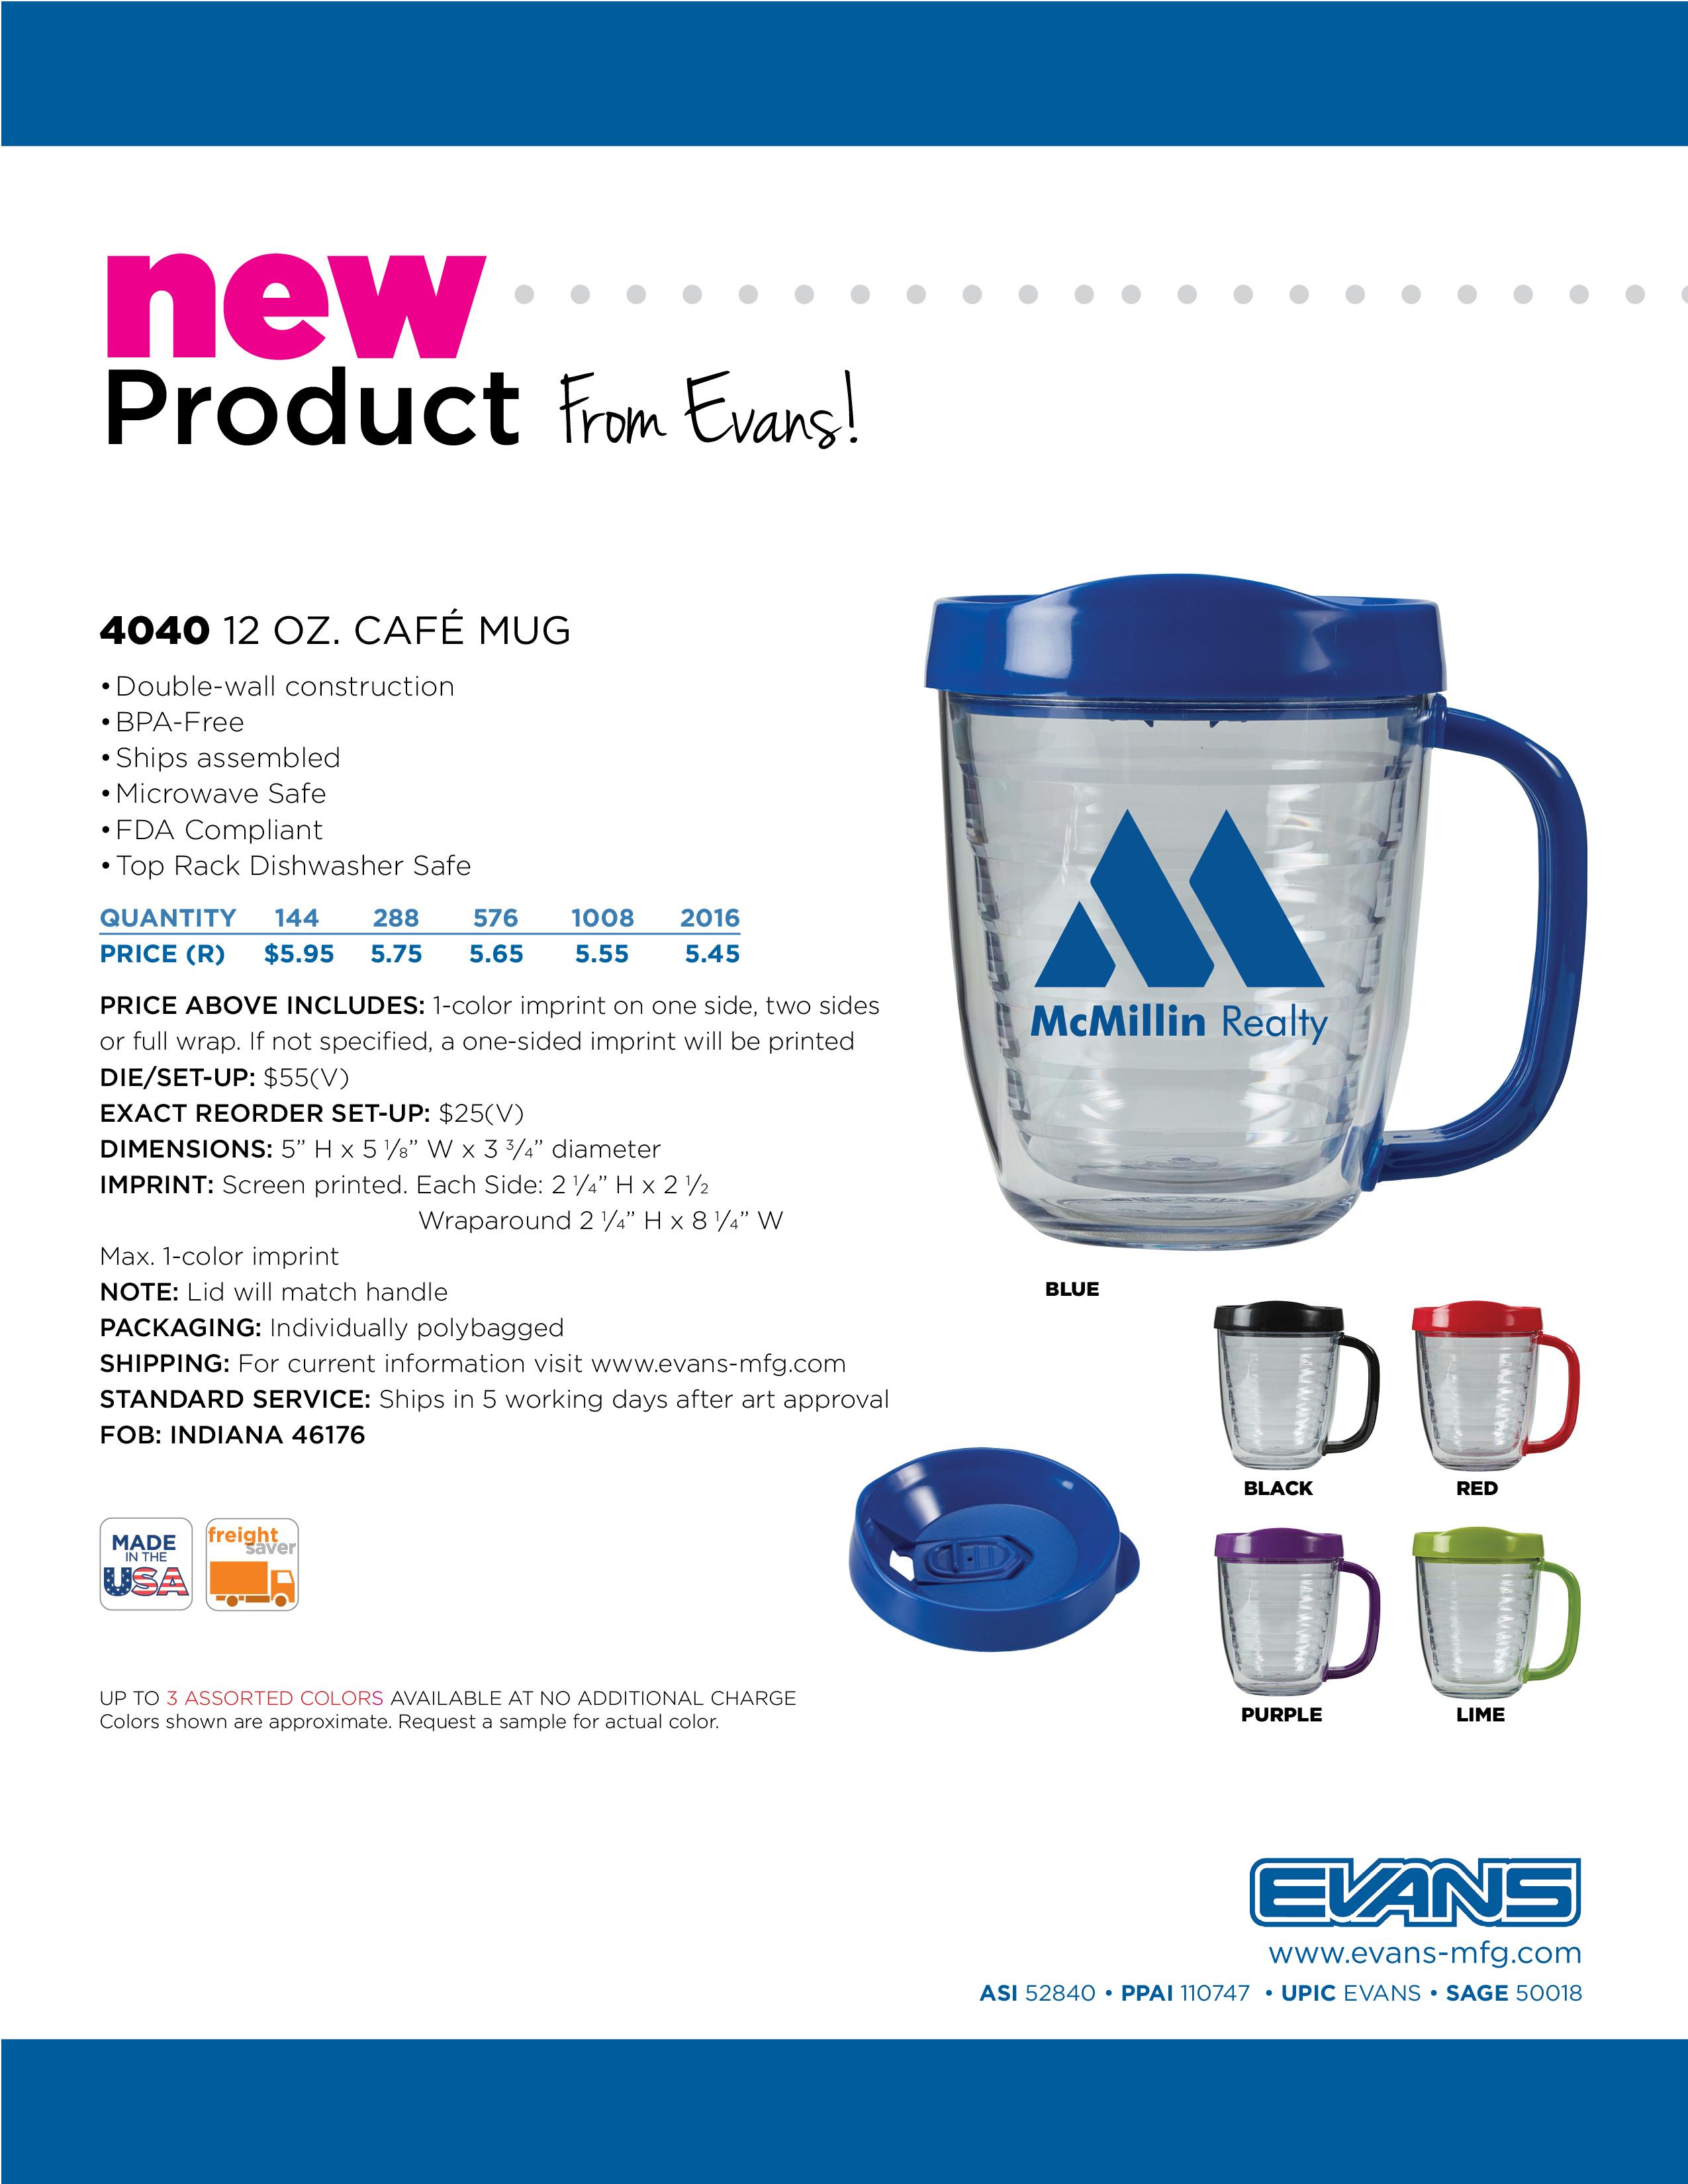 4040 12 oz. Cafe Mug